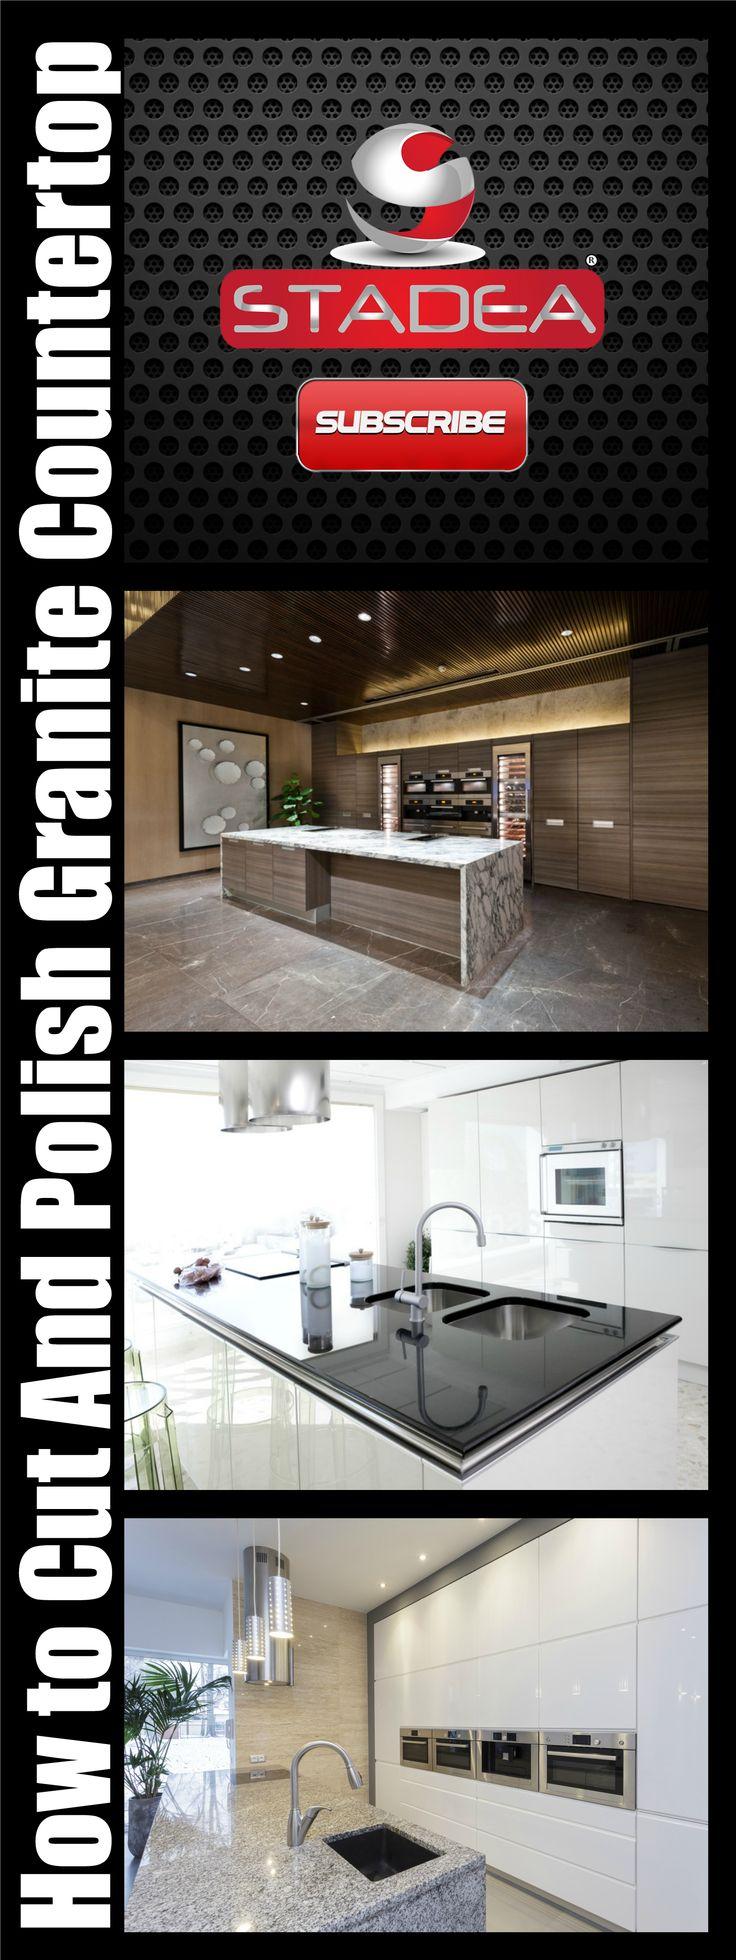 Best 25+ How to polish granite ideas on Pinterest | Granite polish ...